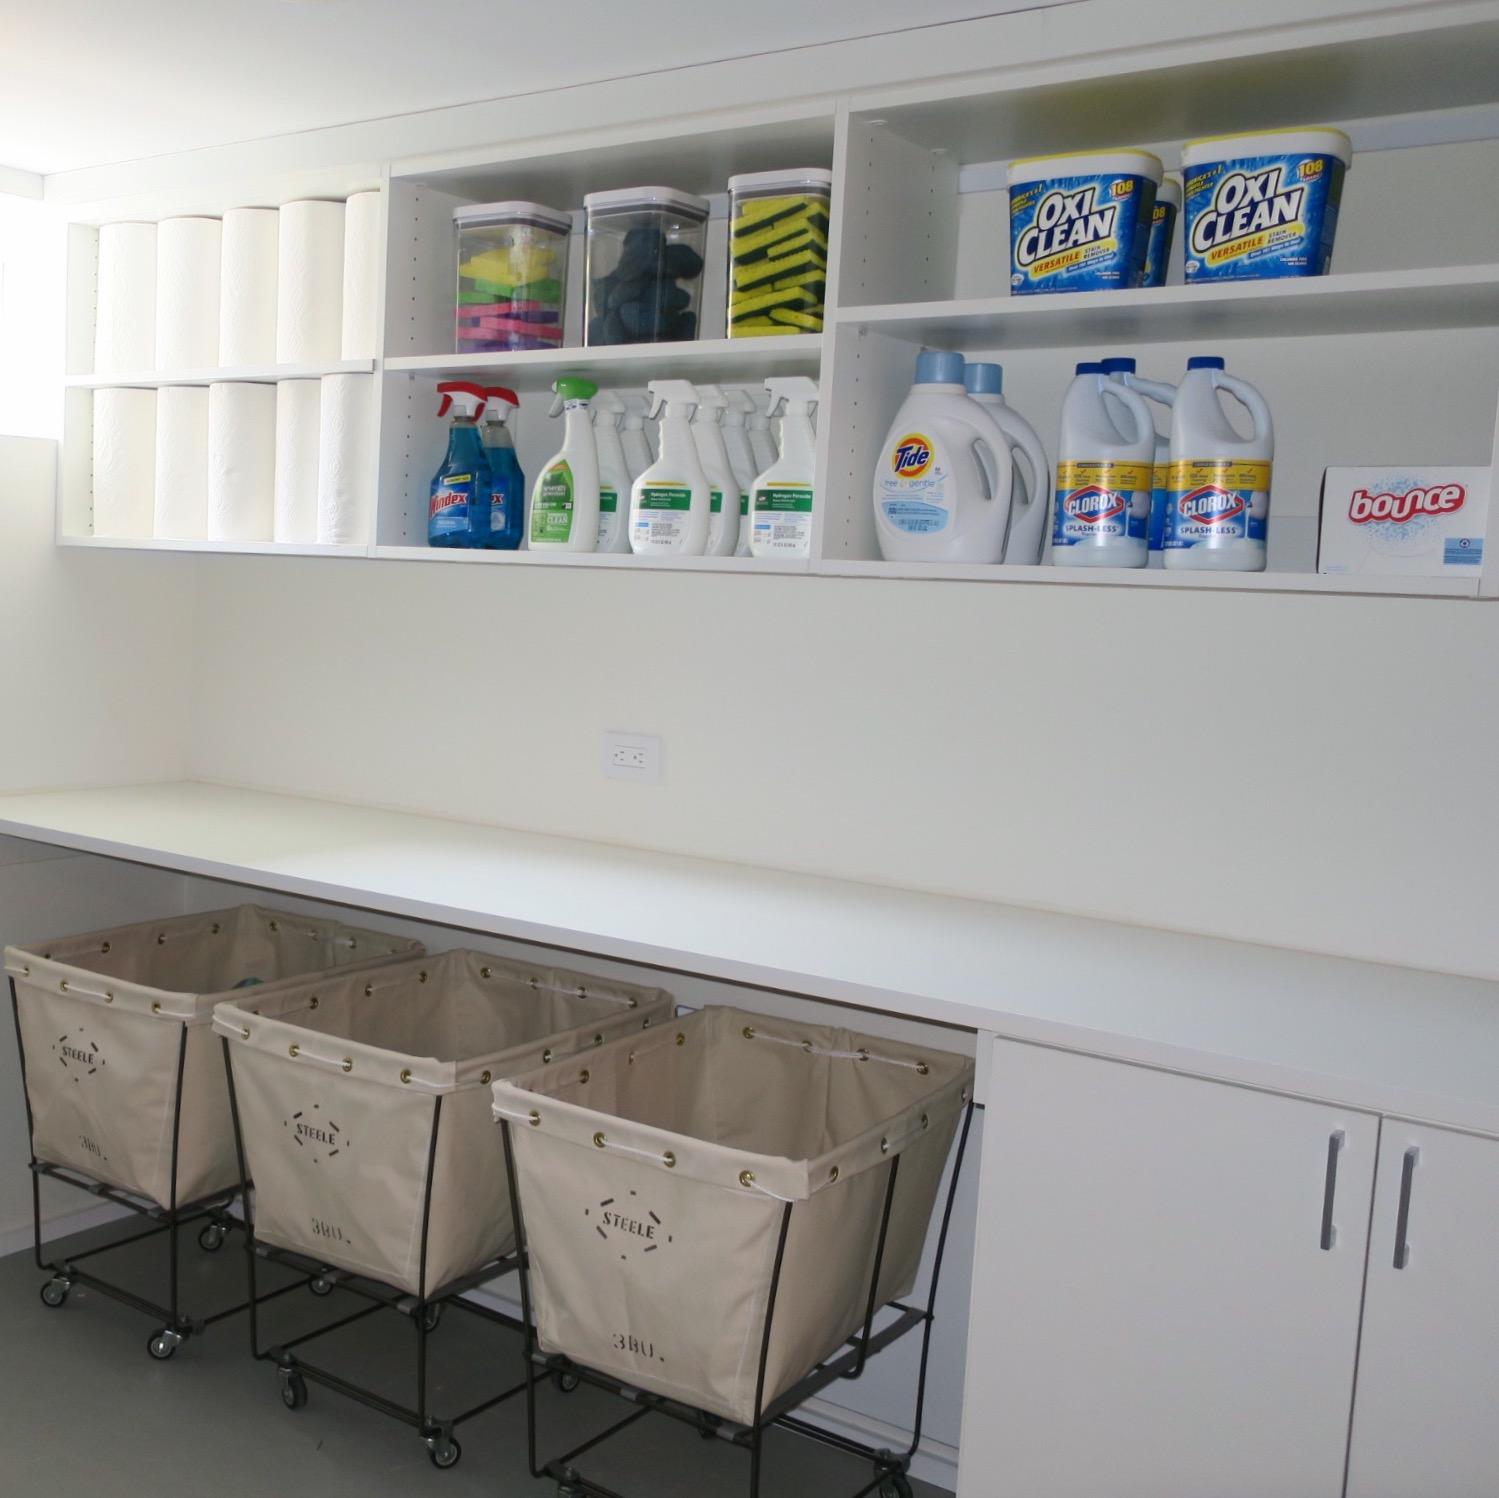 Shelfie_Organizing_Laundry Room_Hamptons Home_Utility Space